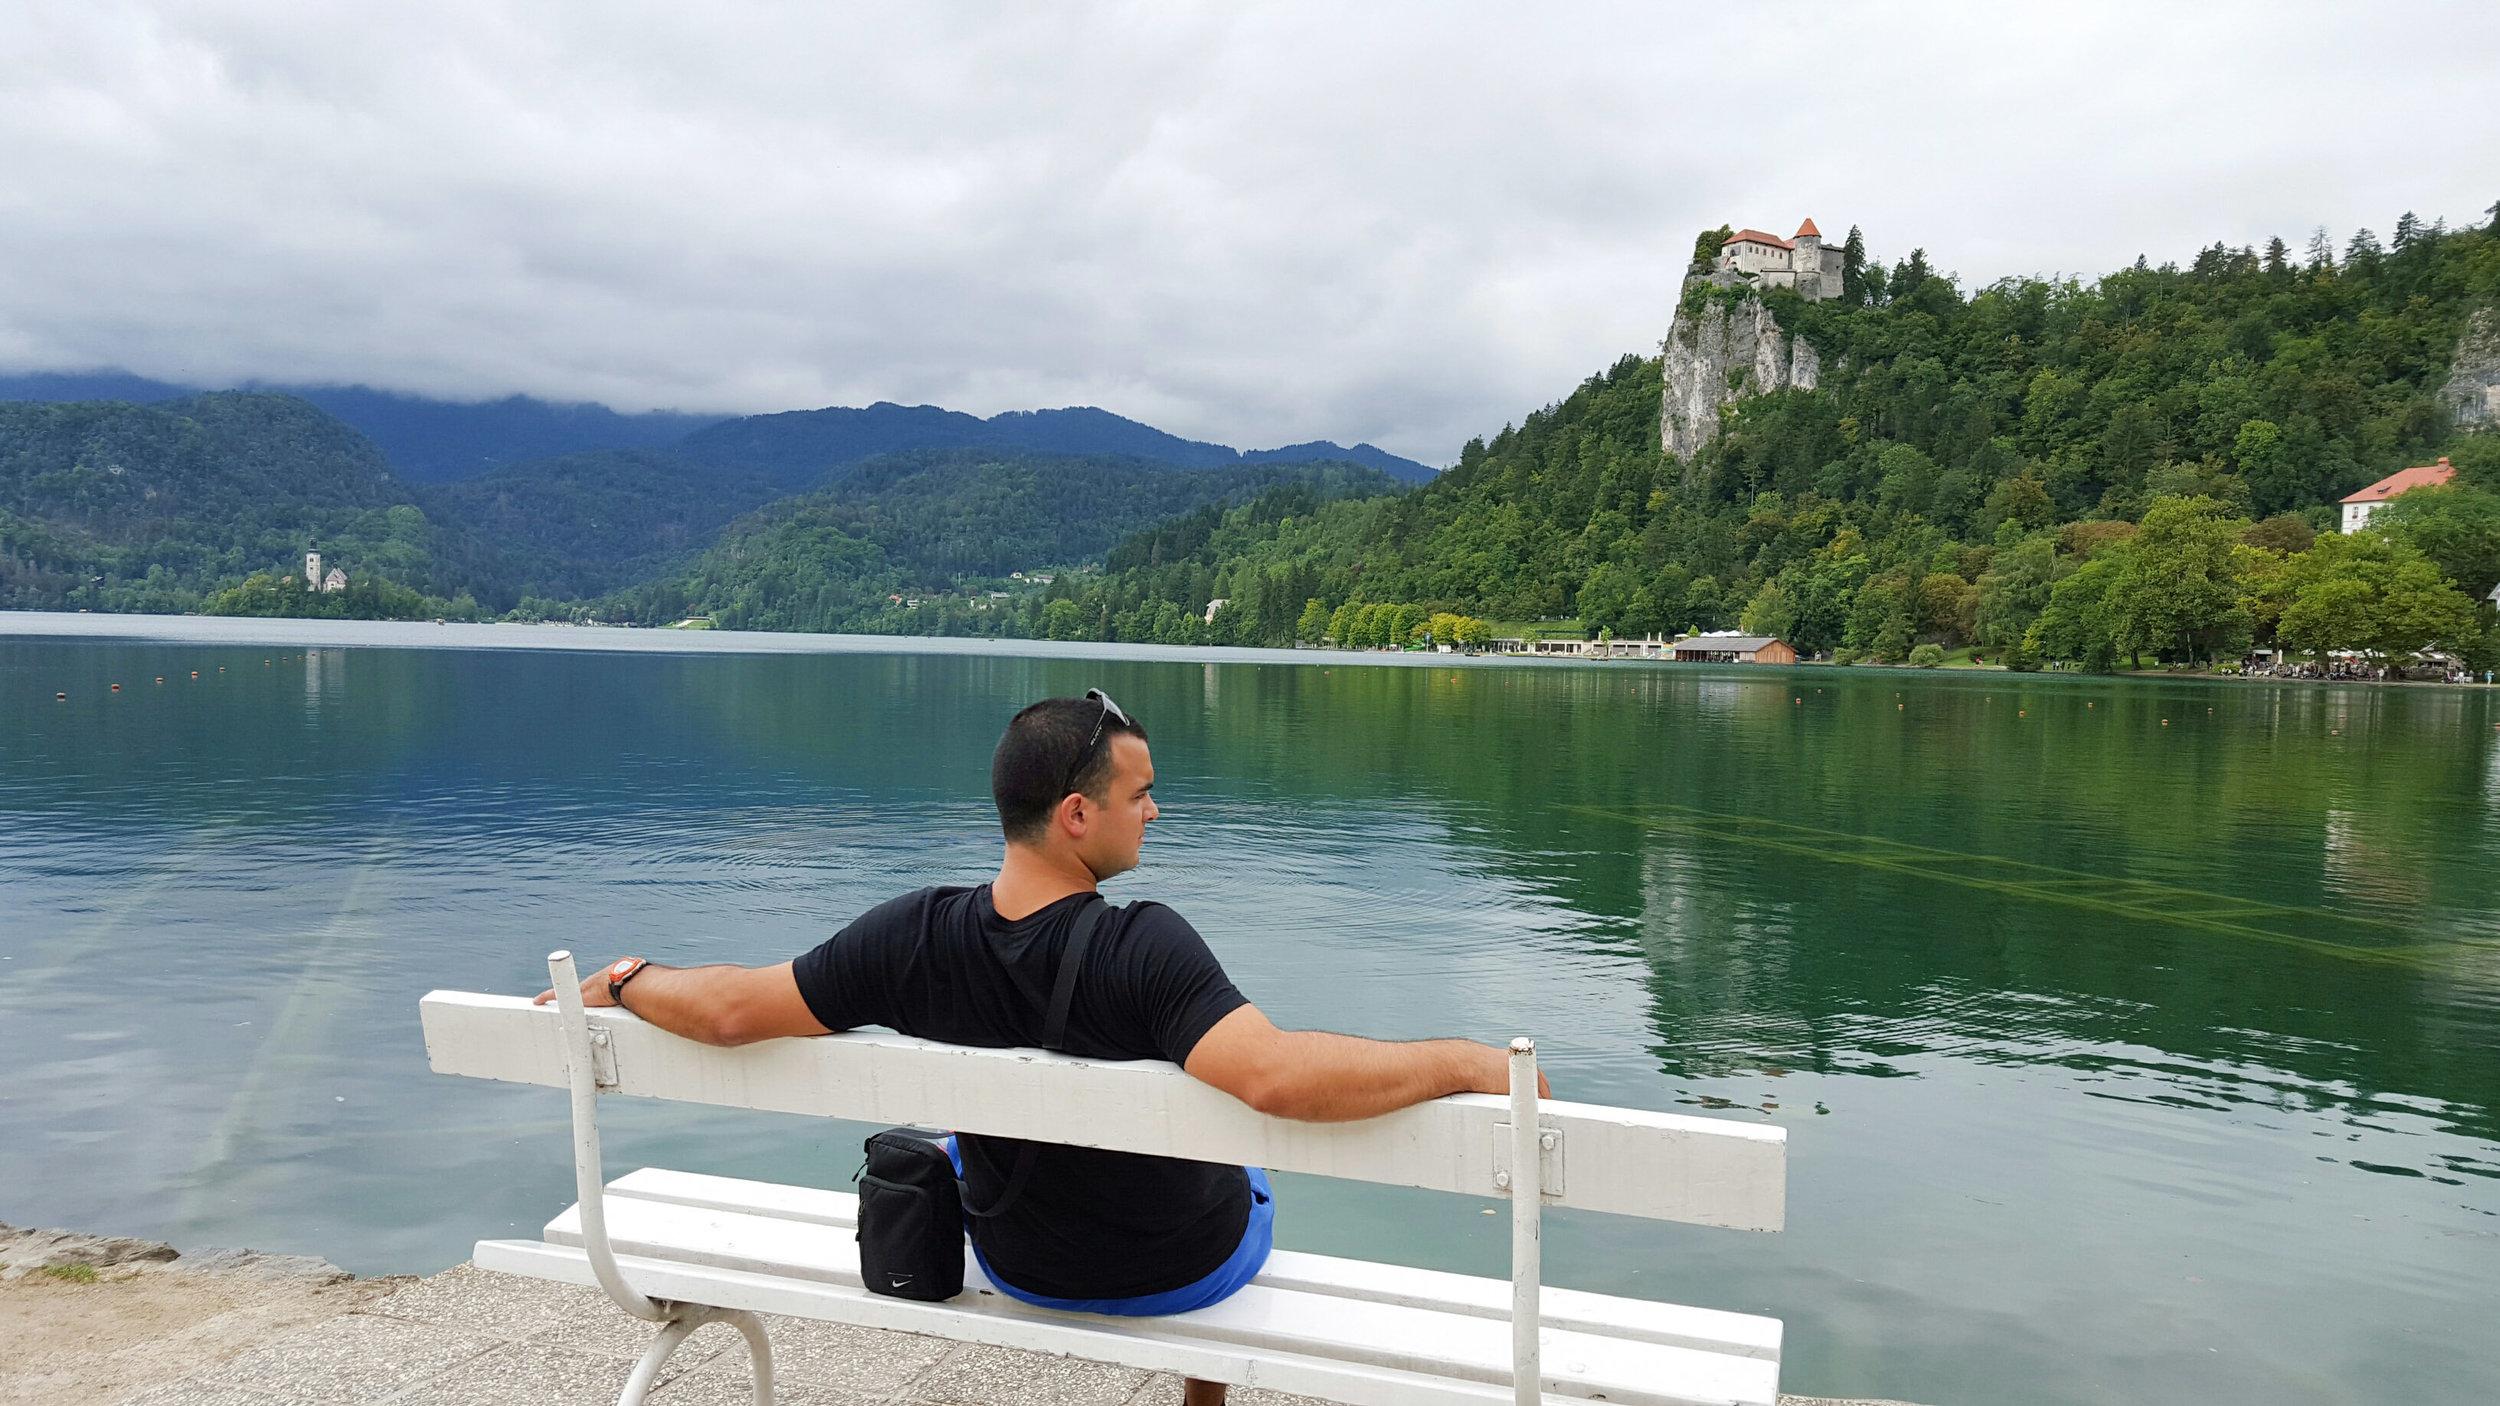 @global.hooperz, dreaming at Bled Lake, Slovenia